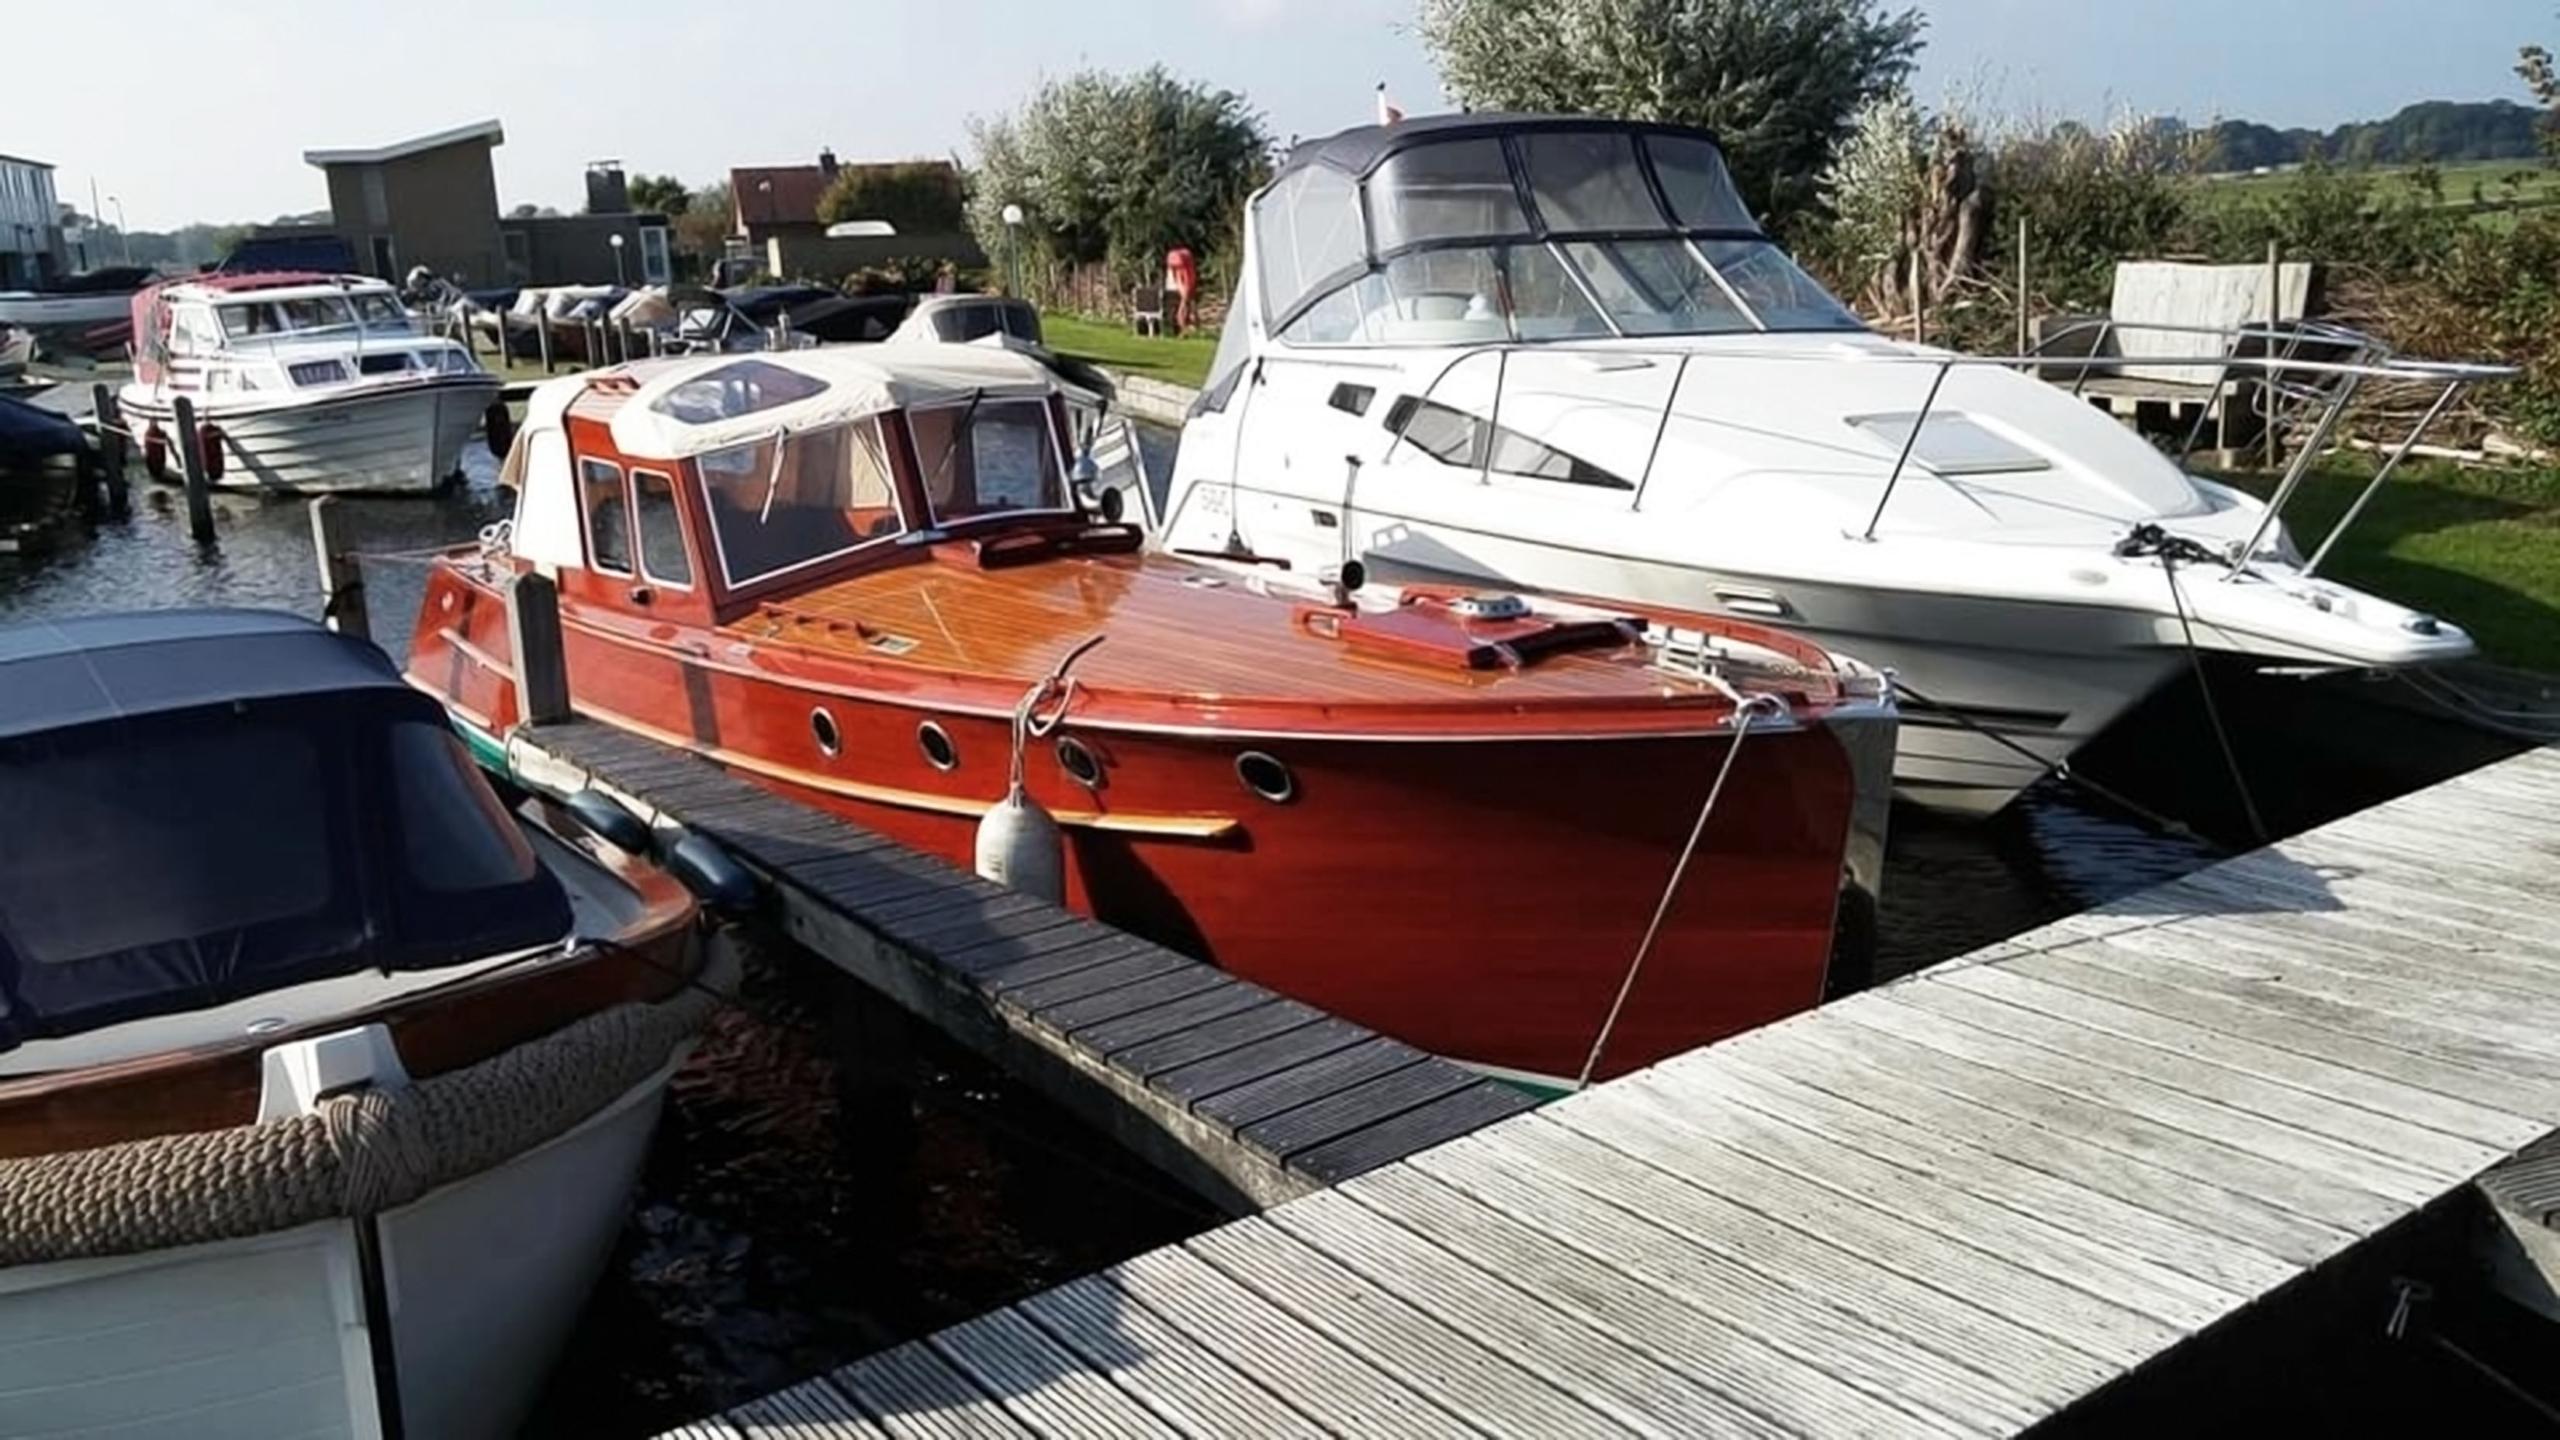 Jachtschilder Friesland-jacht-houten-boot-sloep-Coelan-bootlak-jachtlak-classic-design-yacht-painters